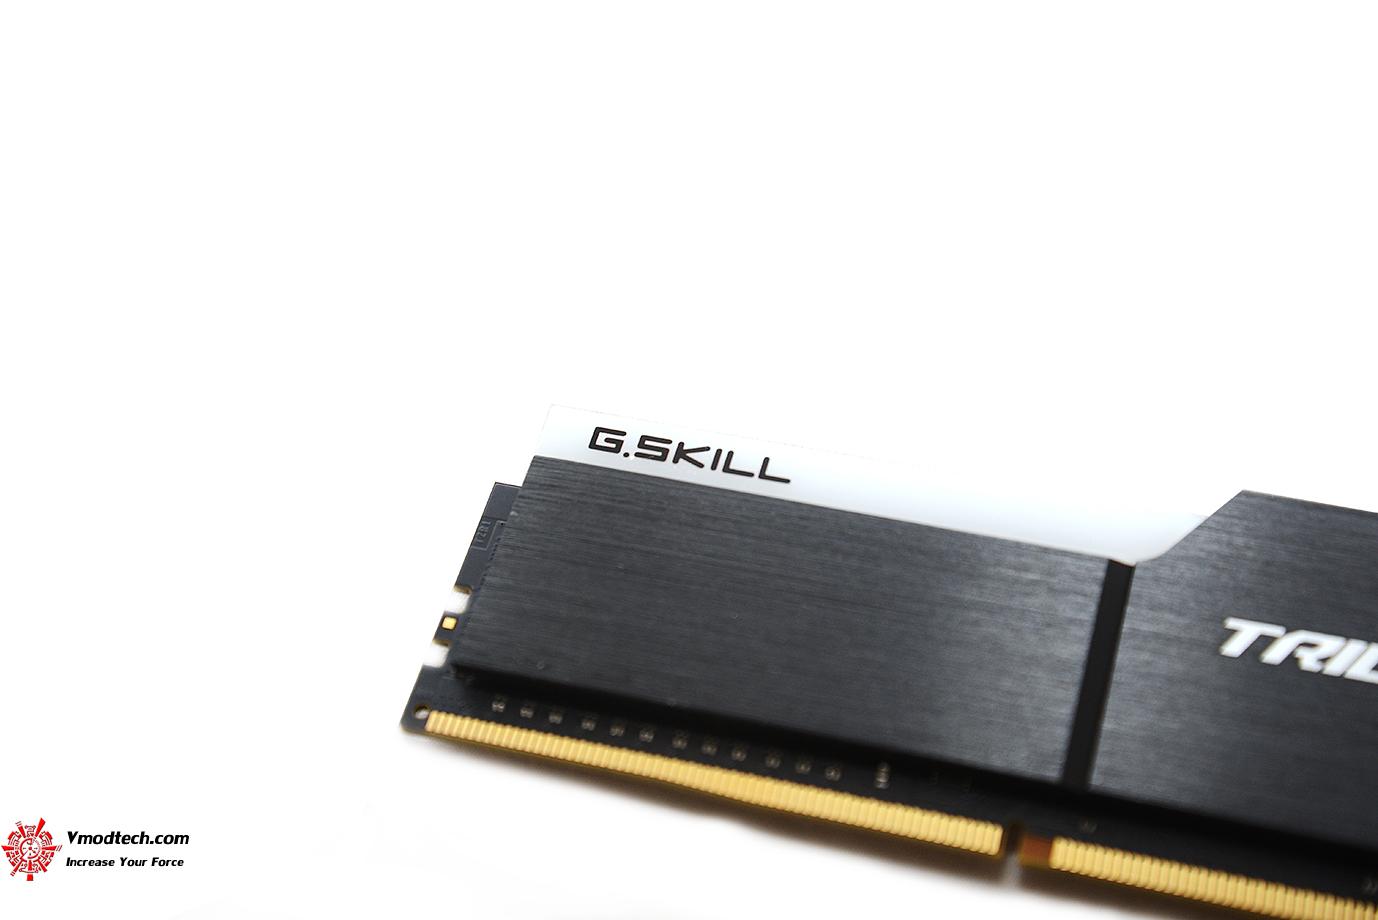 dsc 2940 G.SKILL Trident Z RGB DDR4 3200MHz 32GB (8GBx4) Quad Channel Review